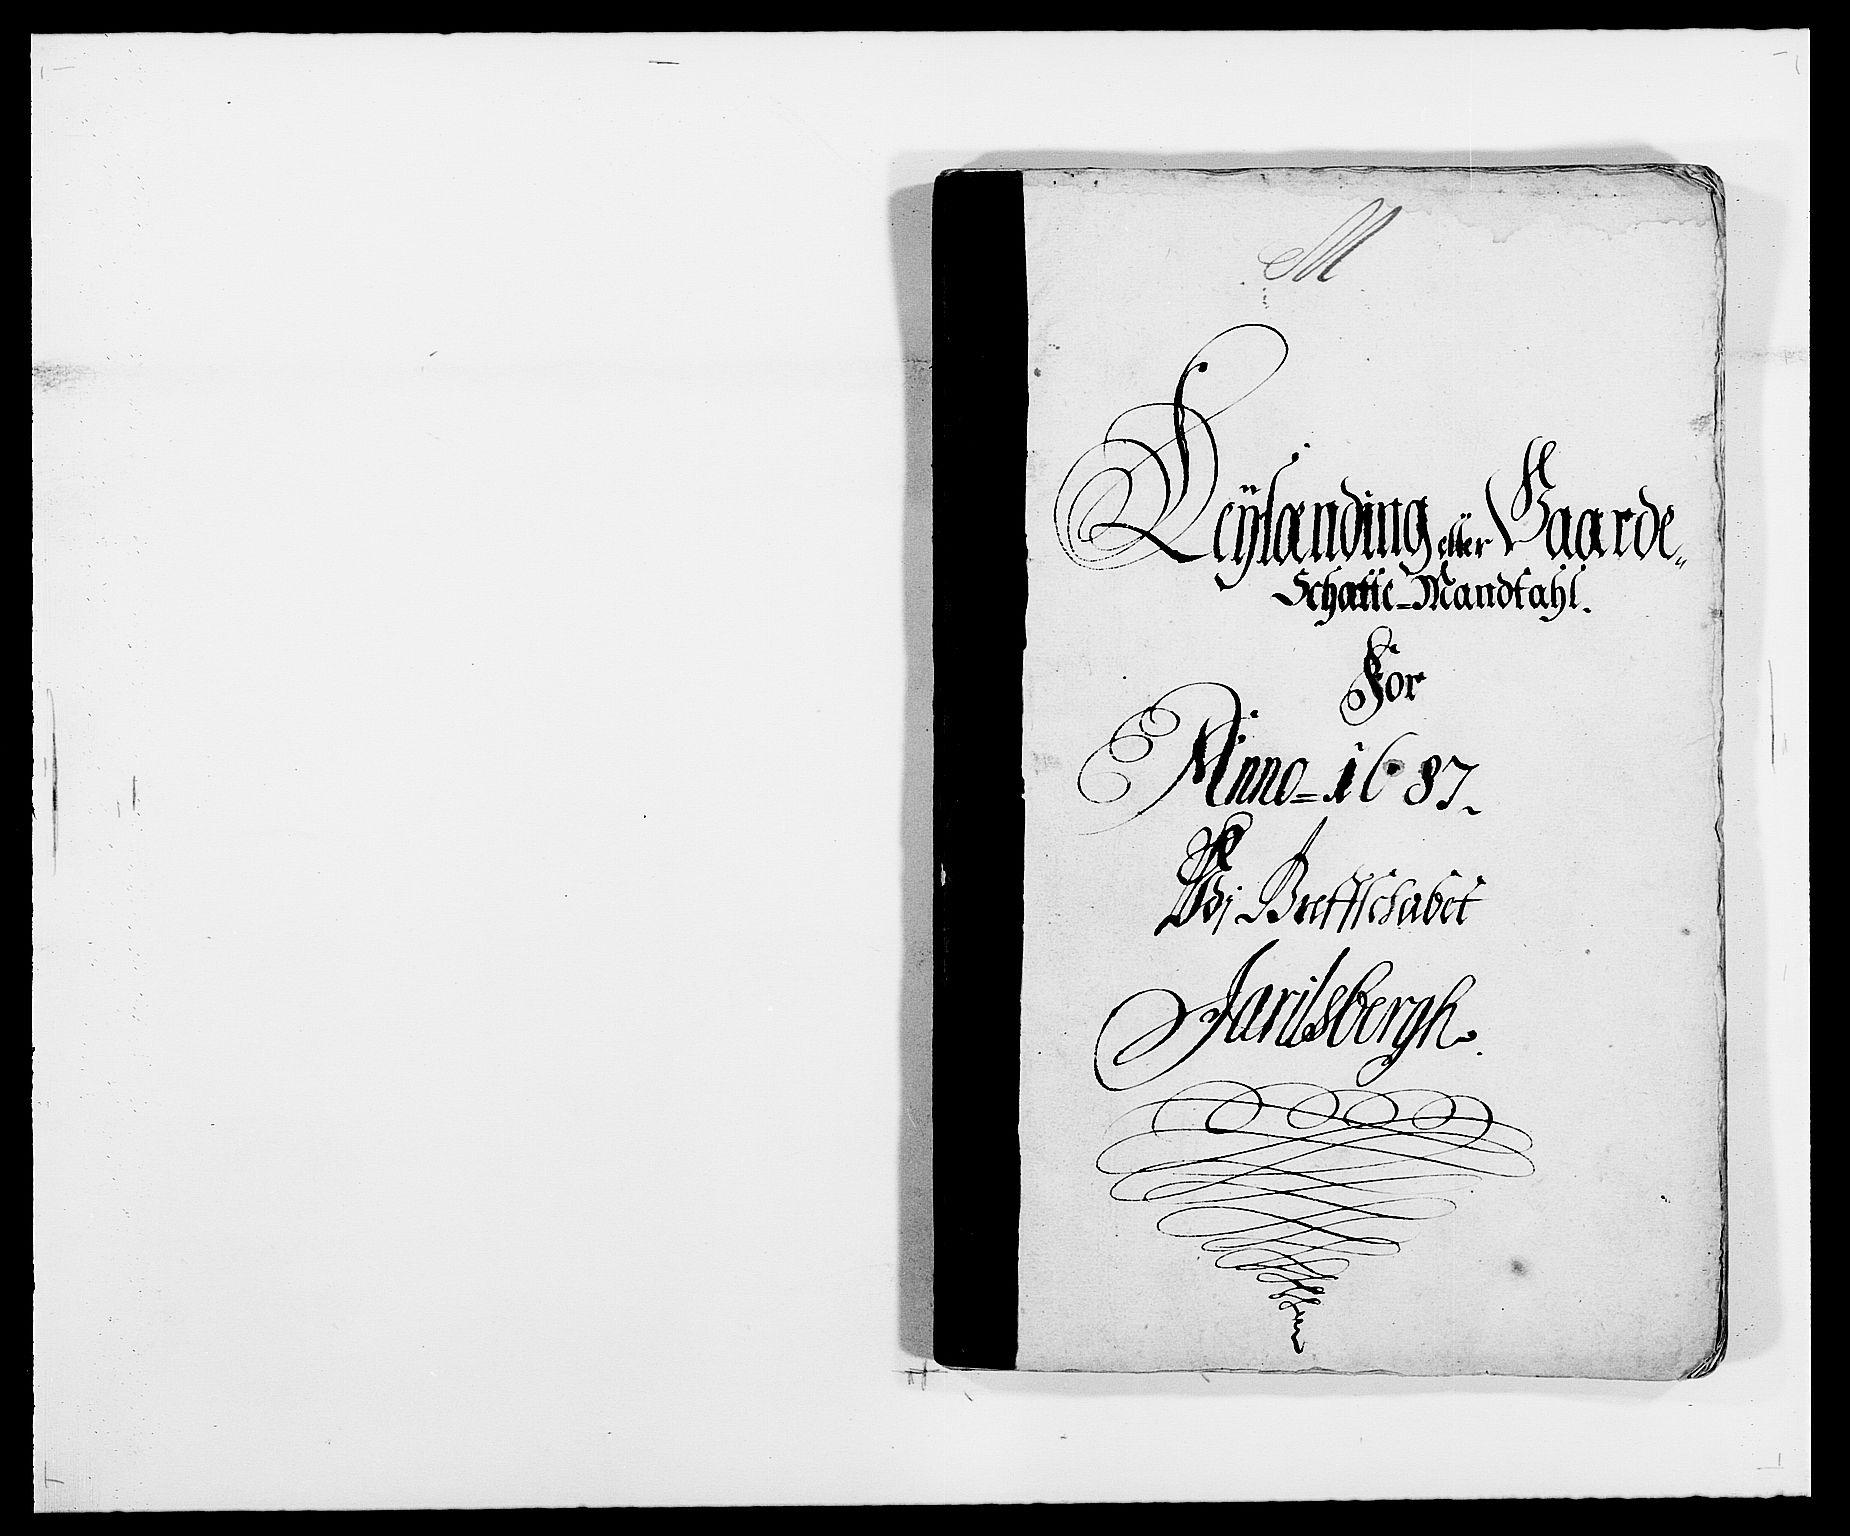 RA, Rentekammeret inntil 1814, Reviderte regnskaper, Fogderegnskap, R32/L1858: Fogderegnskap Jarlsberg grevskap, 1686-1690, s. 8